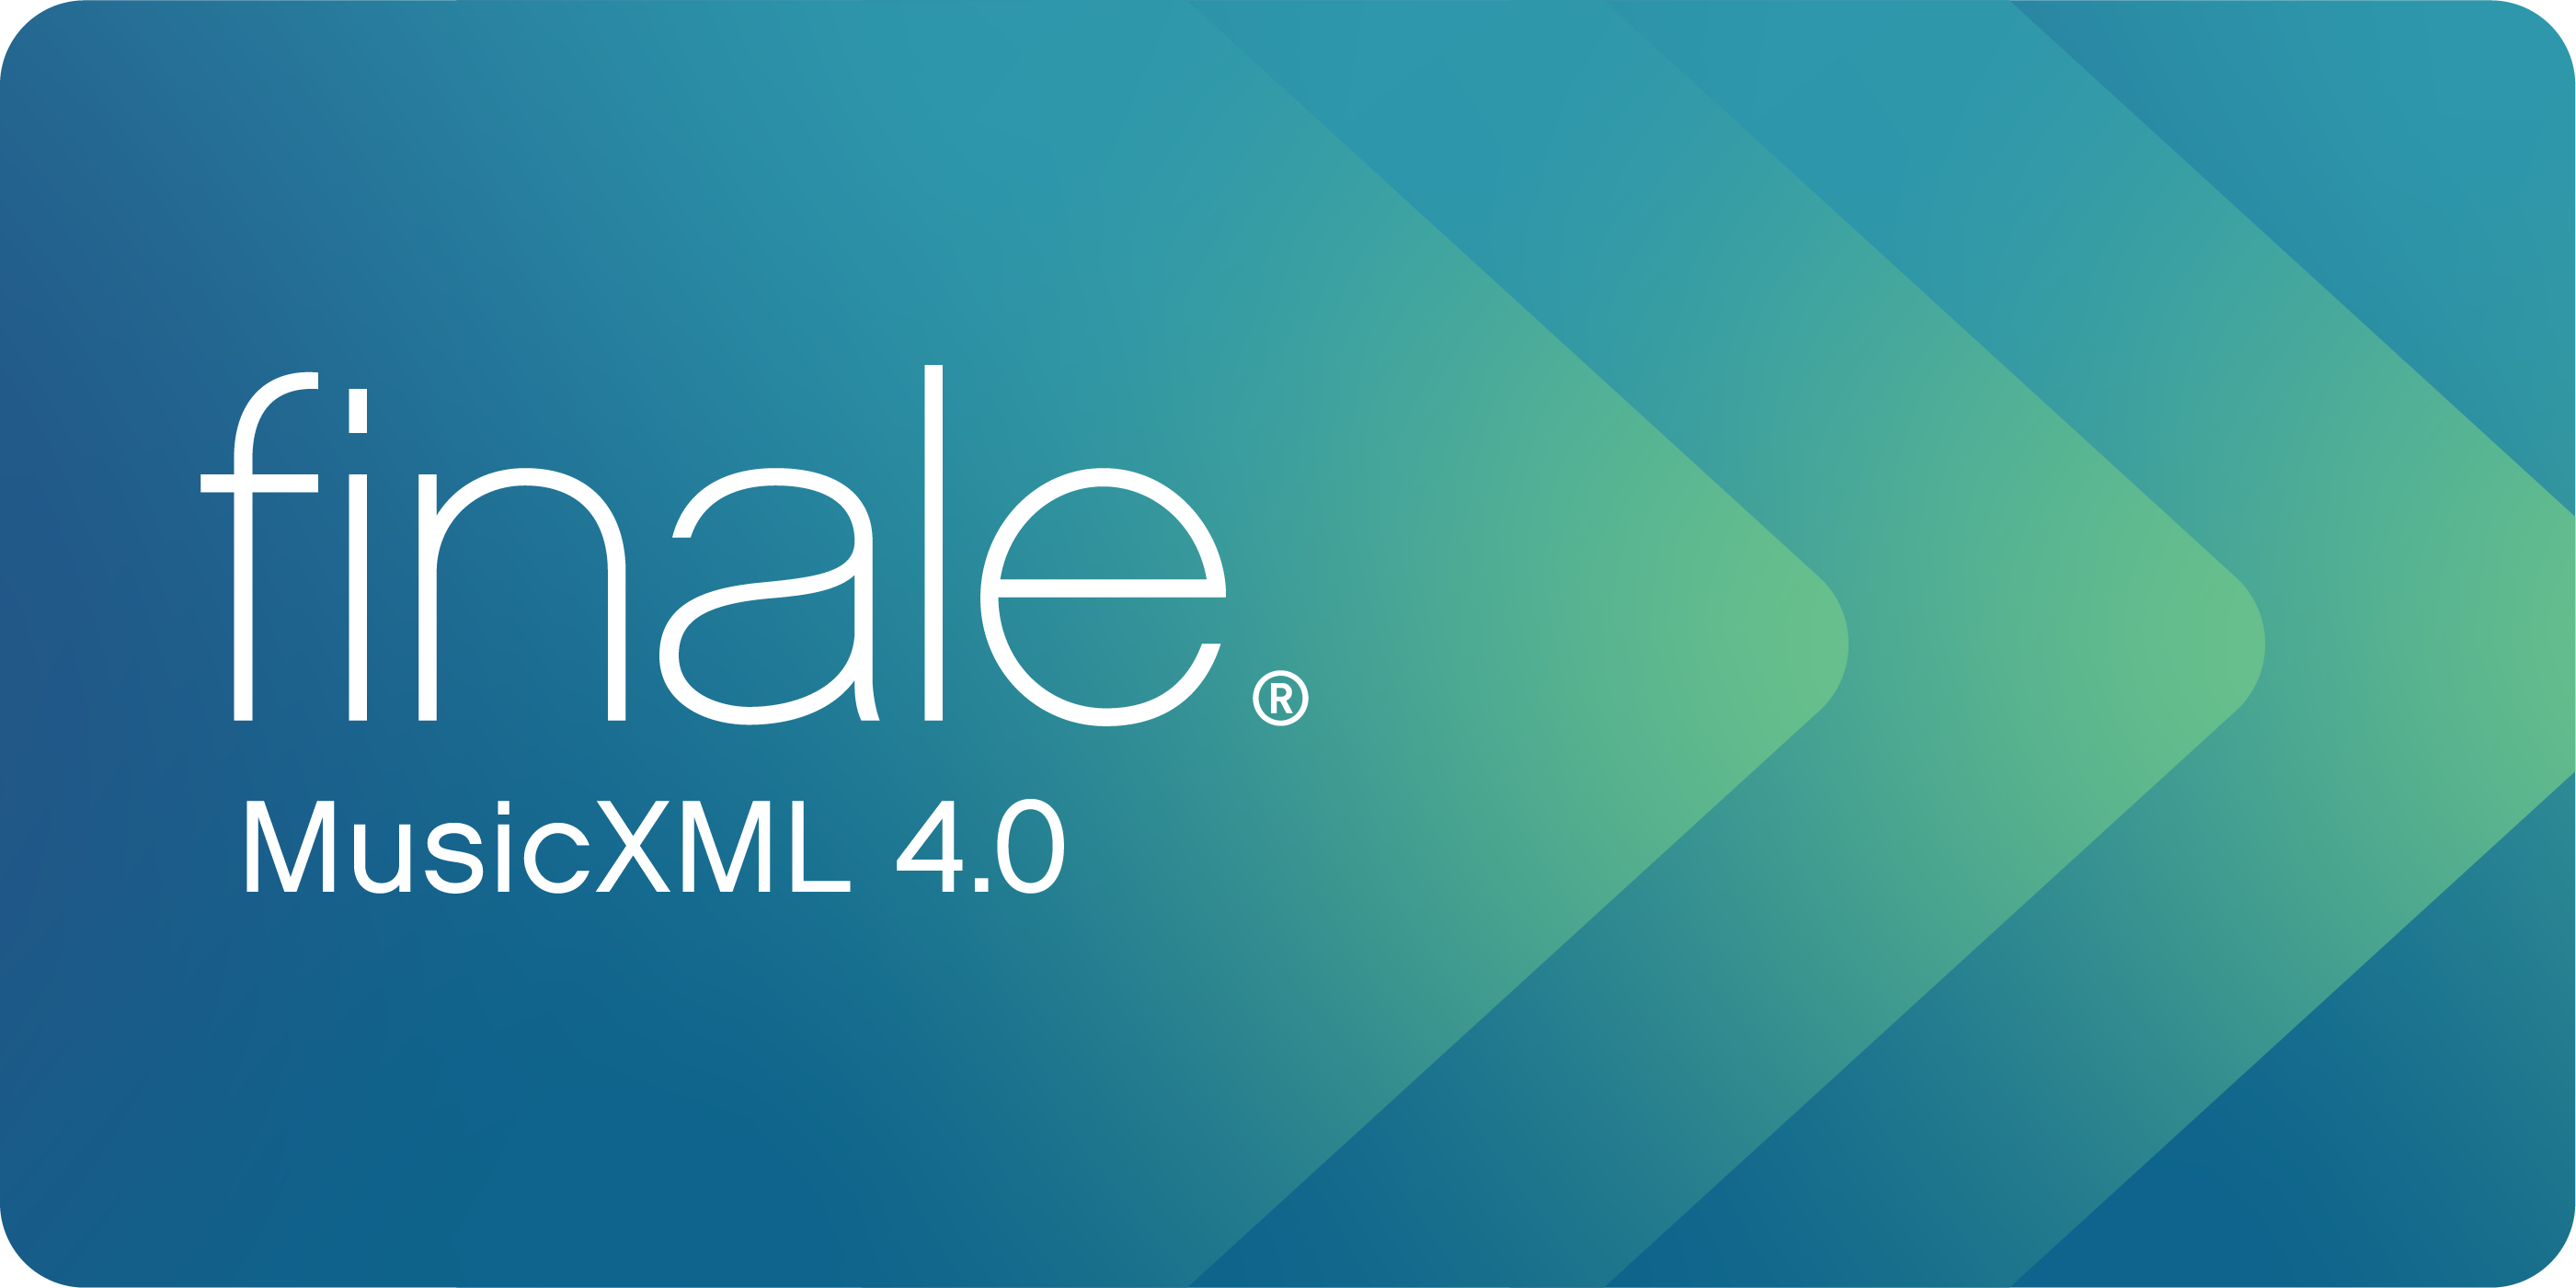 musicxml 4.0